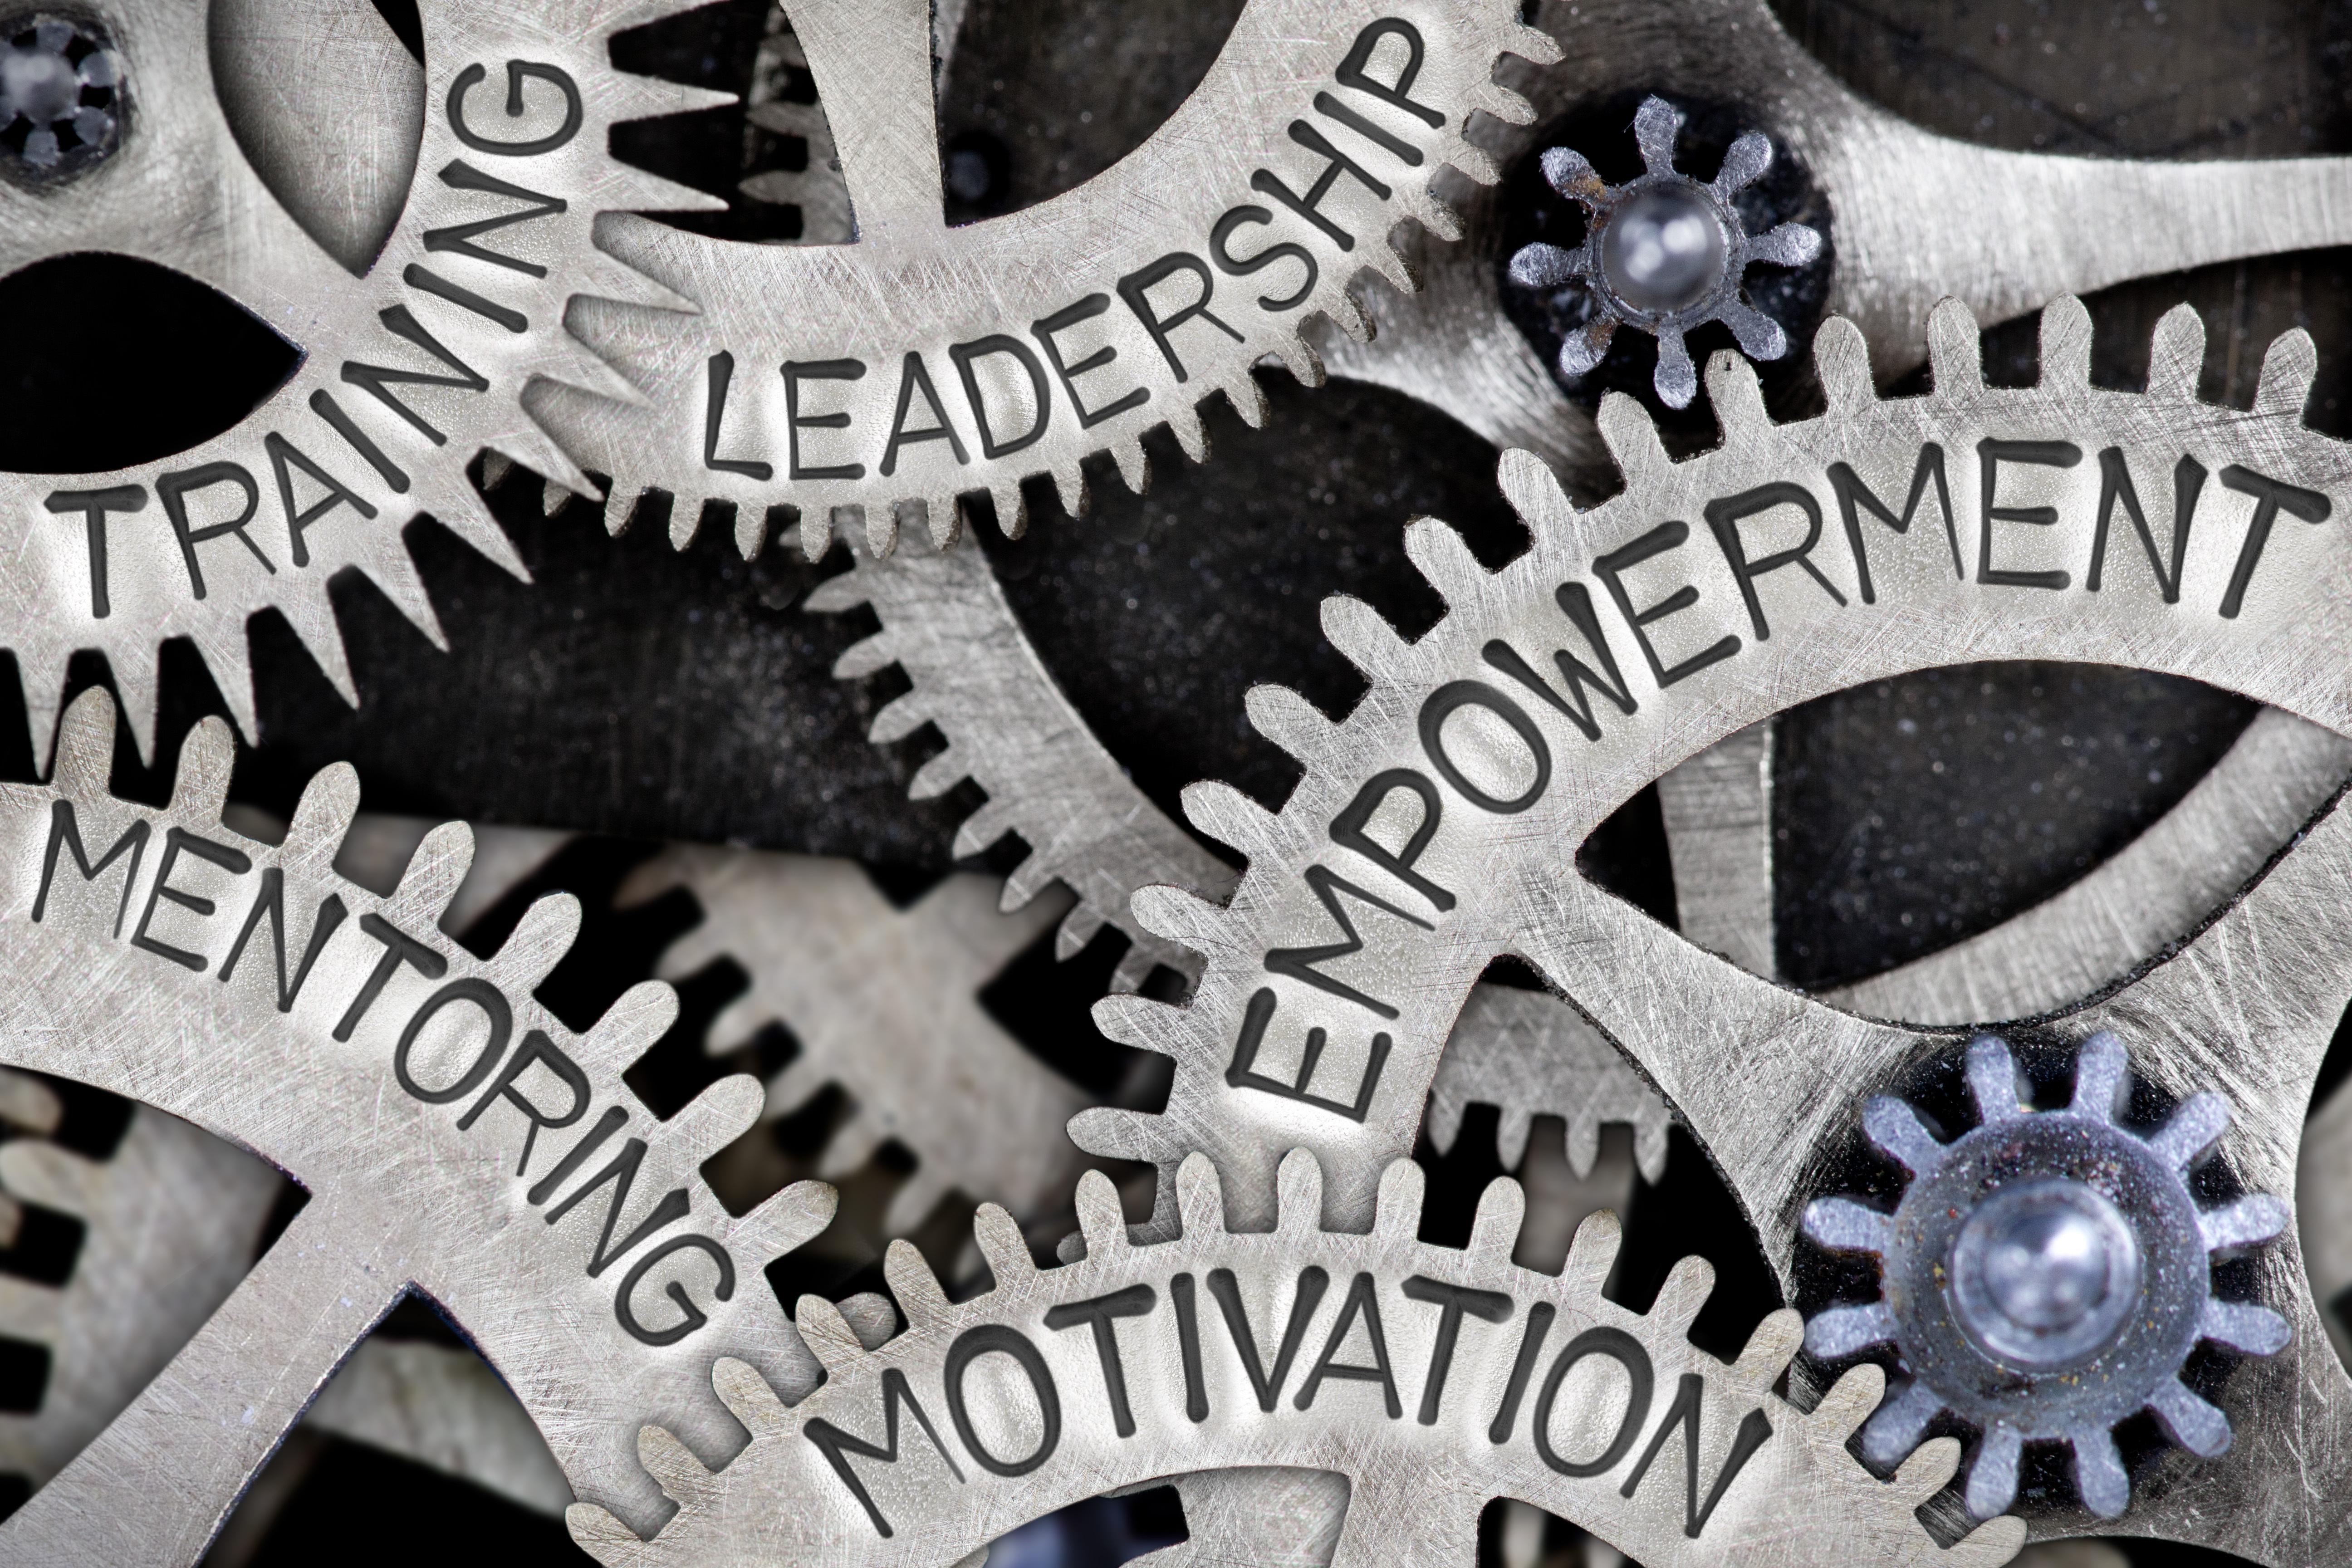 Cogs of leadership